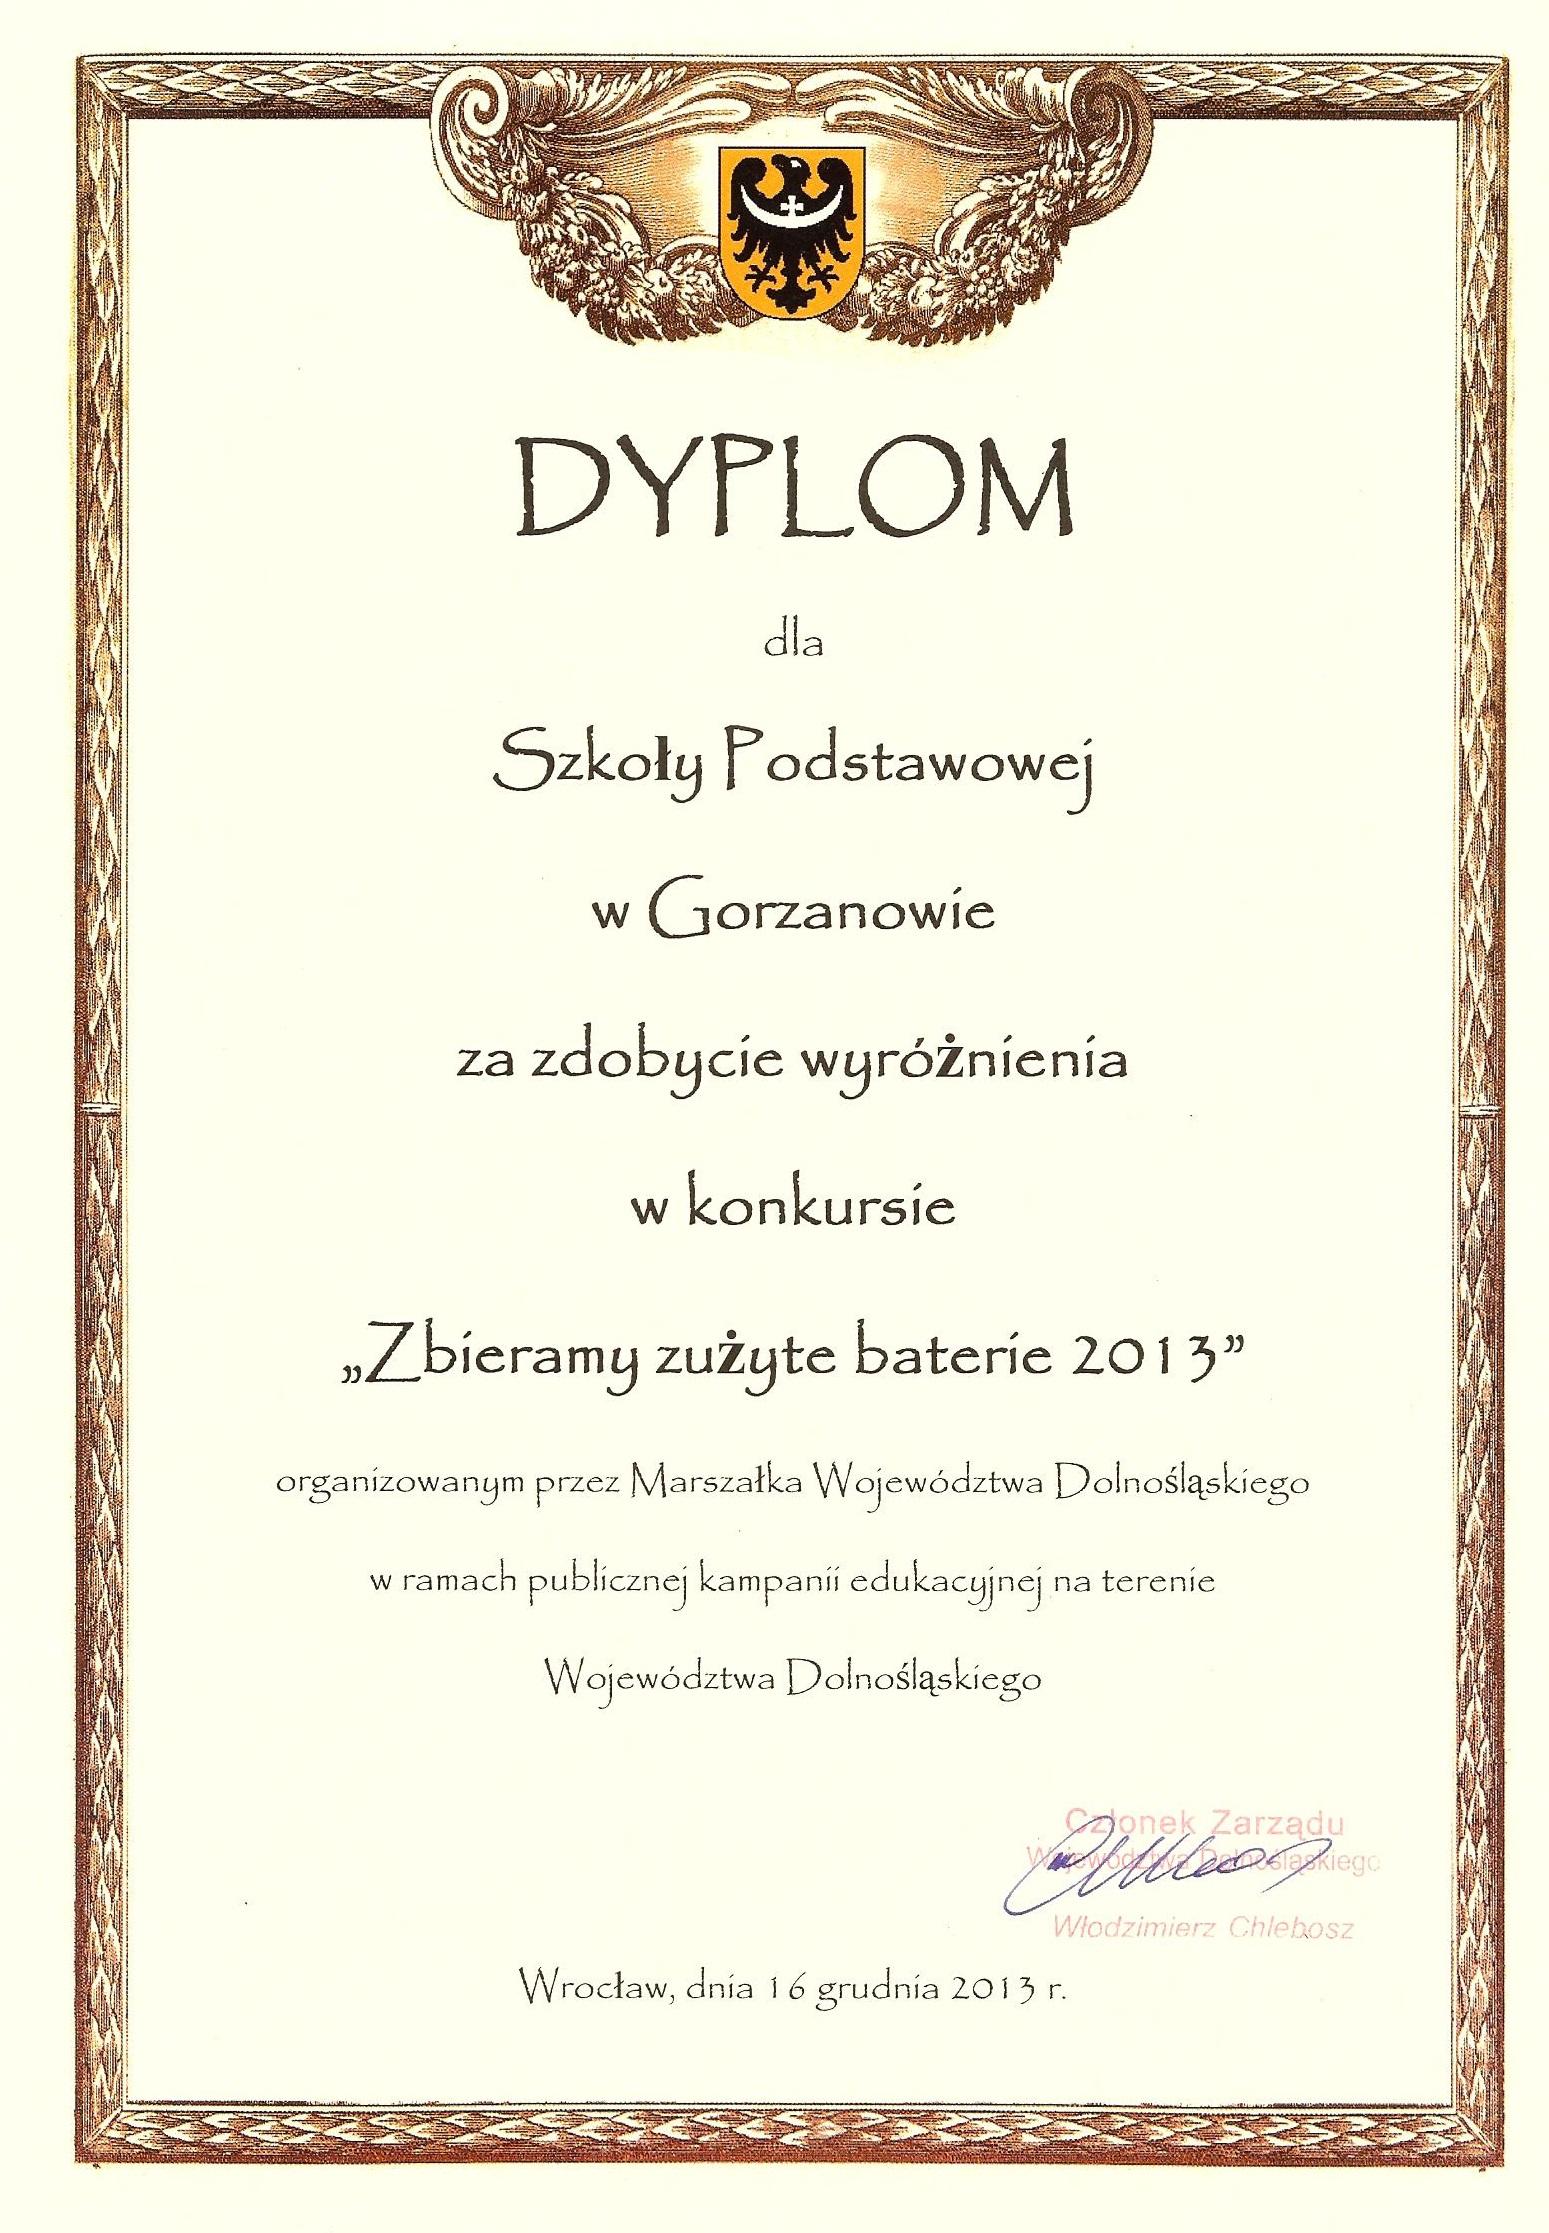 Dyplom_Zużyte_baterie_2013.12.16